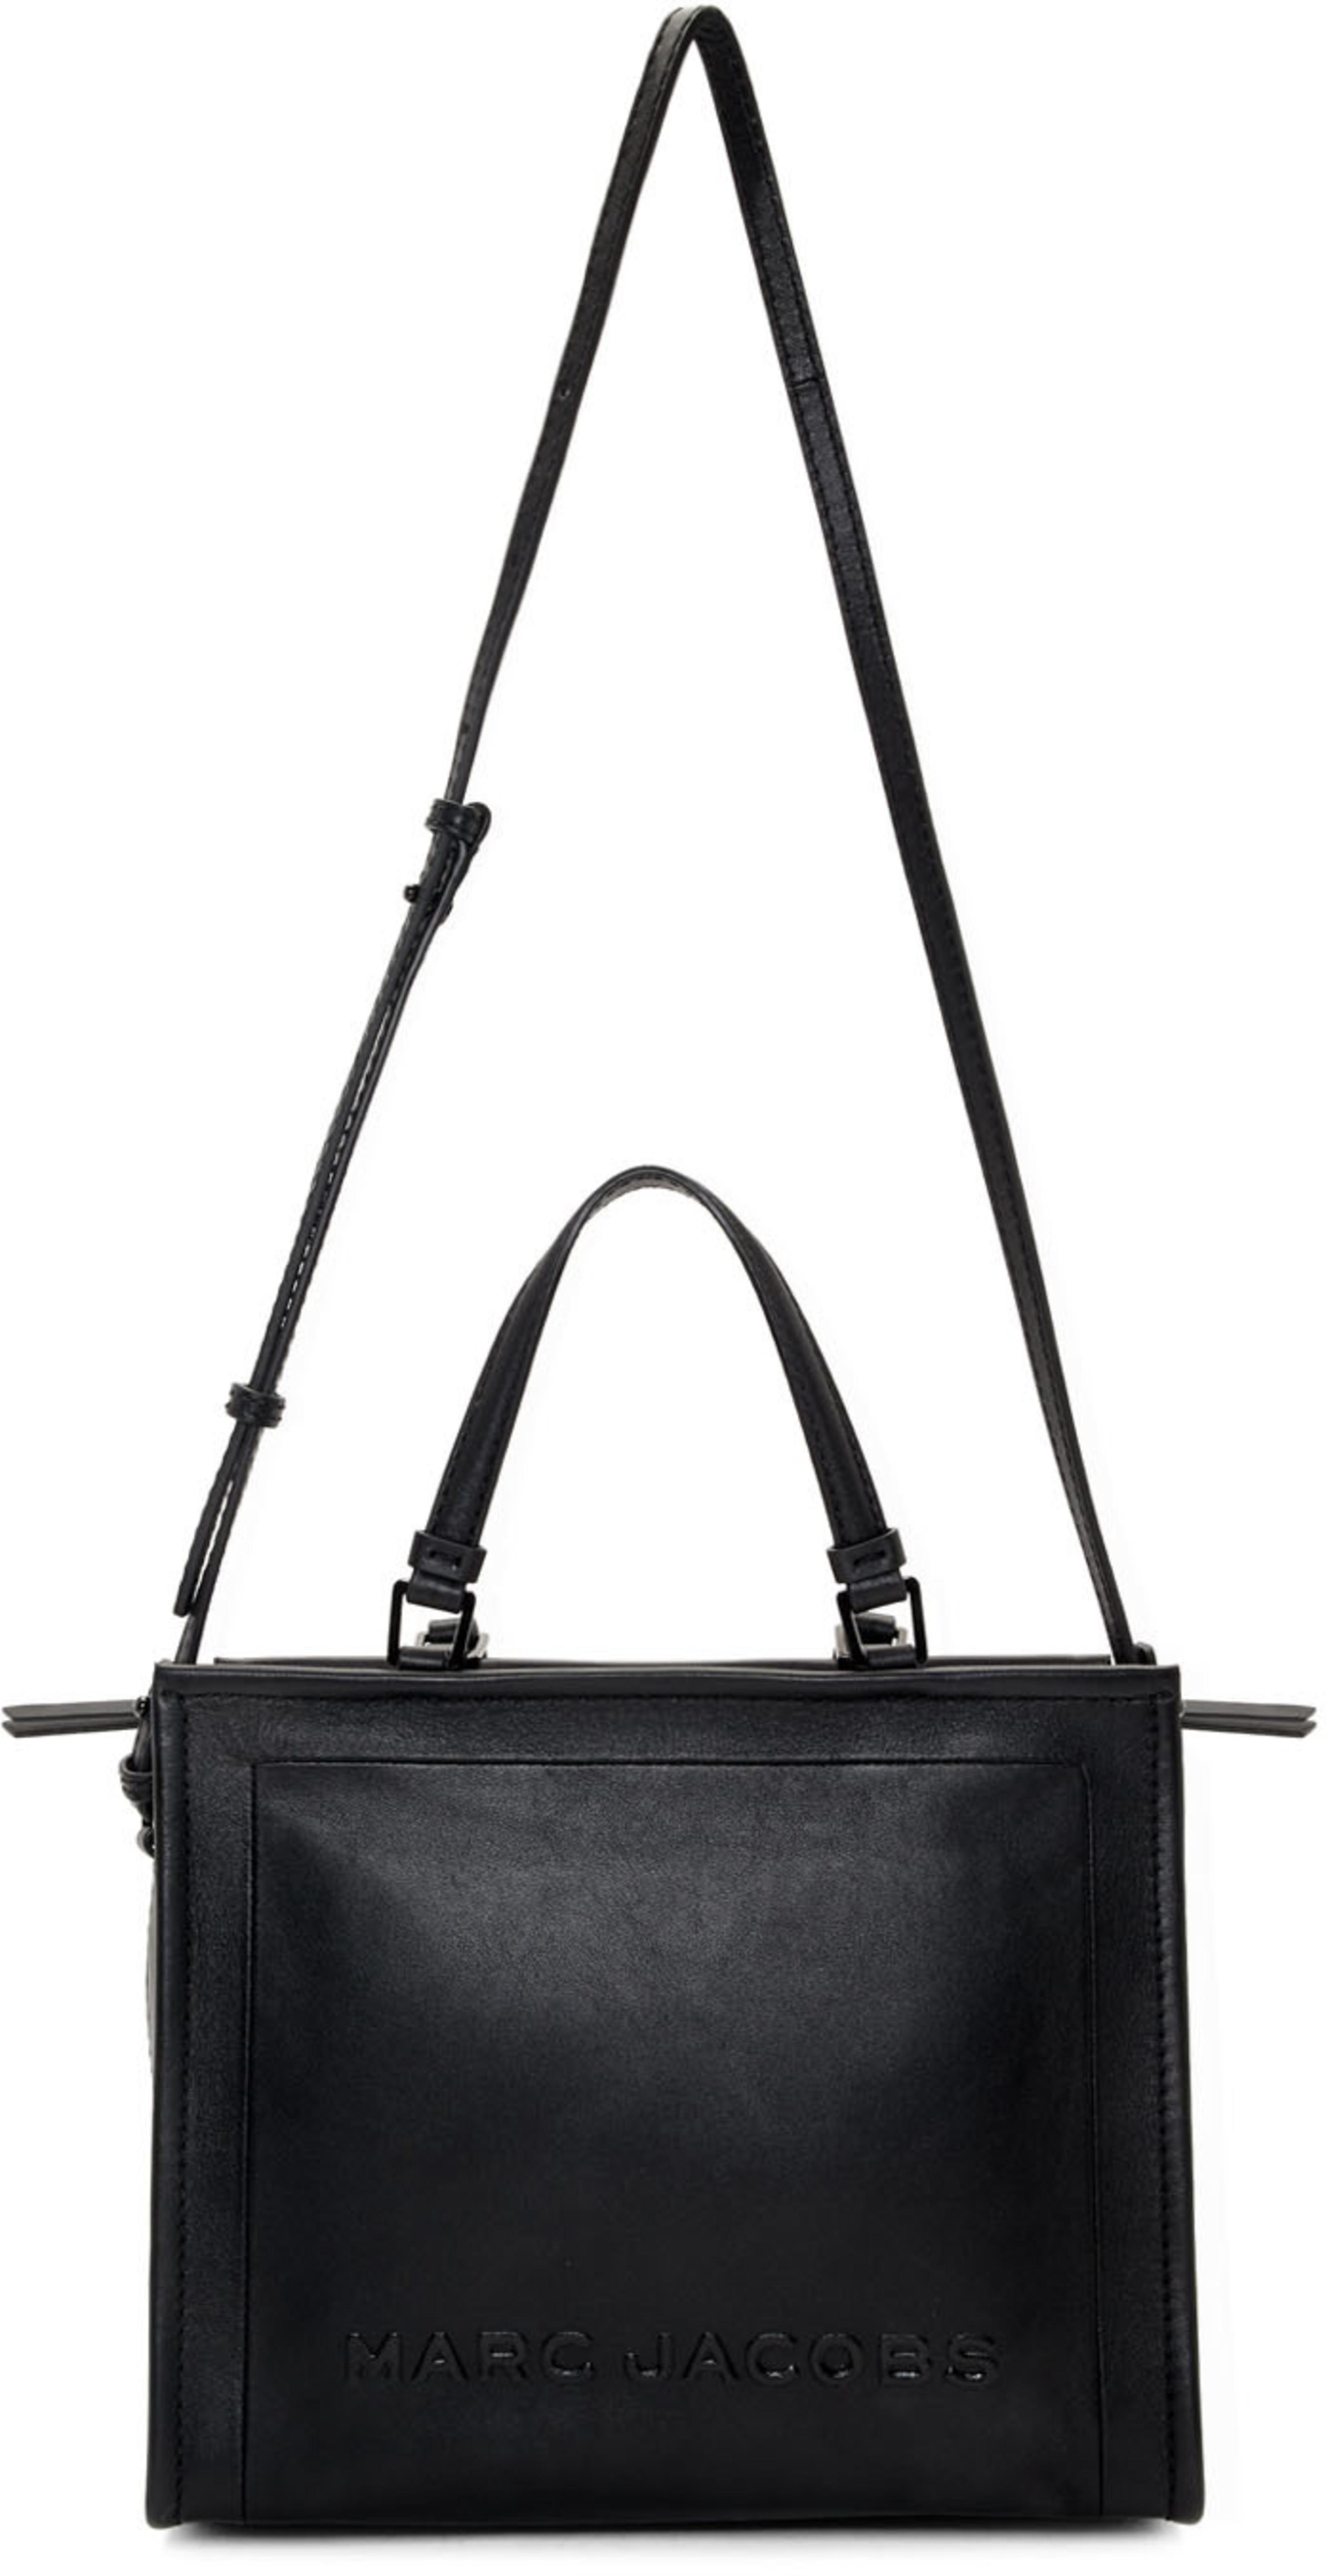 Marc Jacobs bags for Women  0b7e3bd66f590